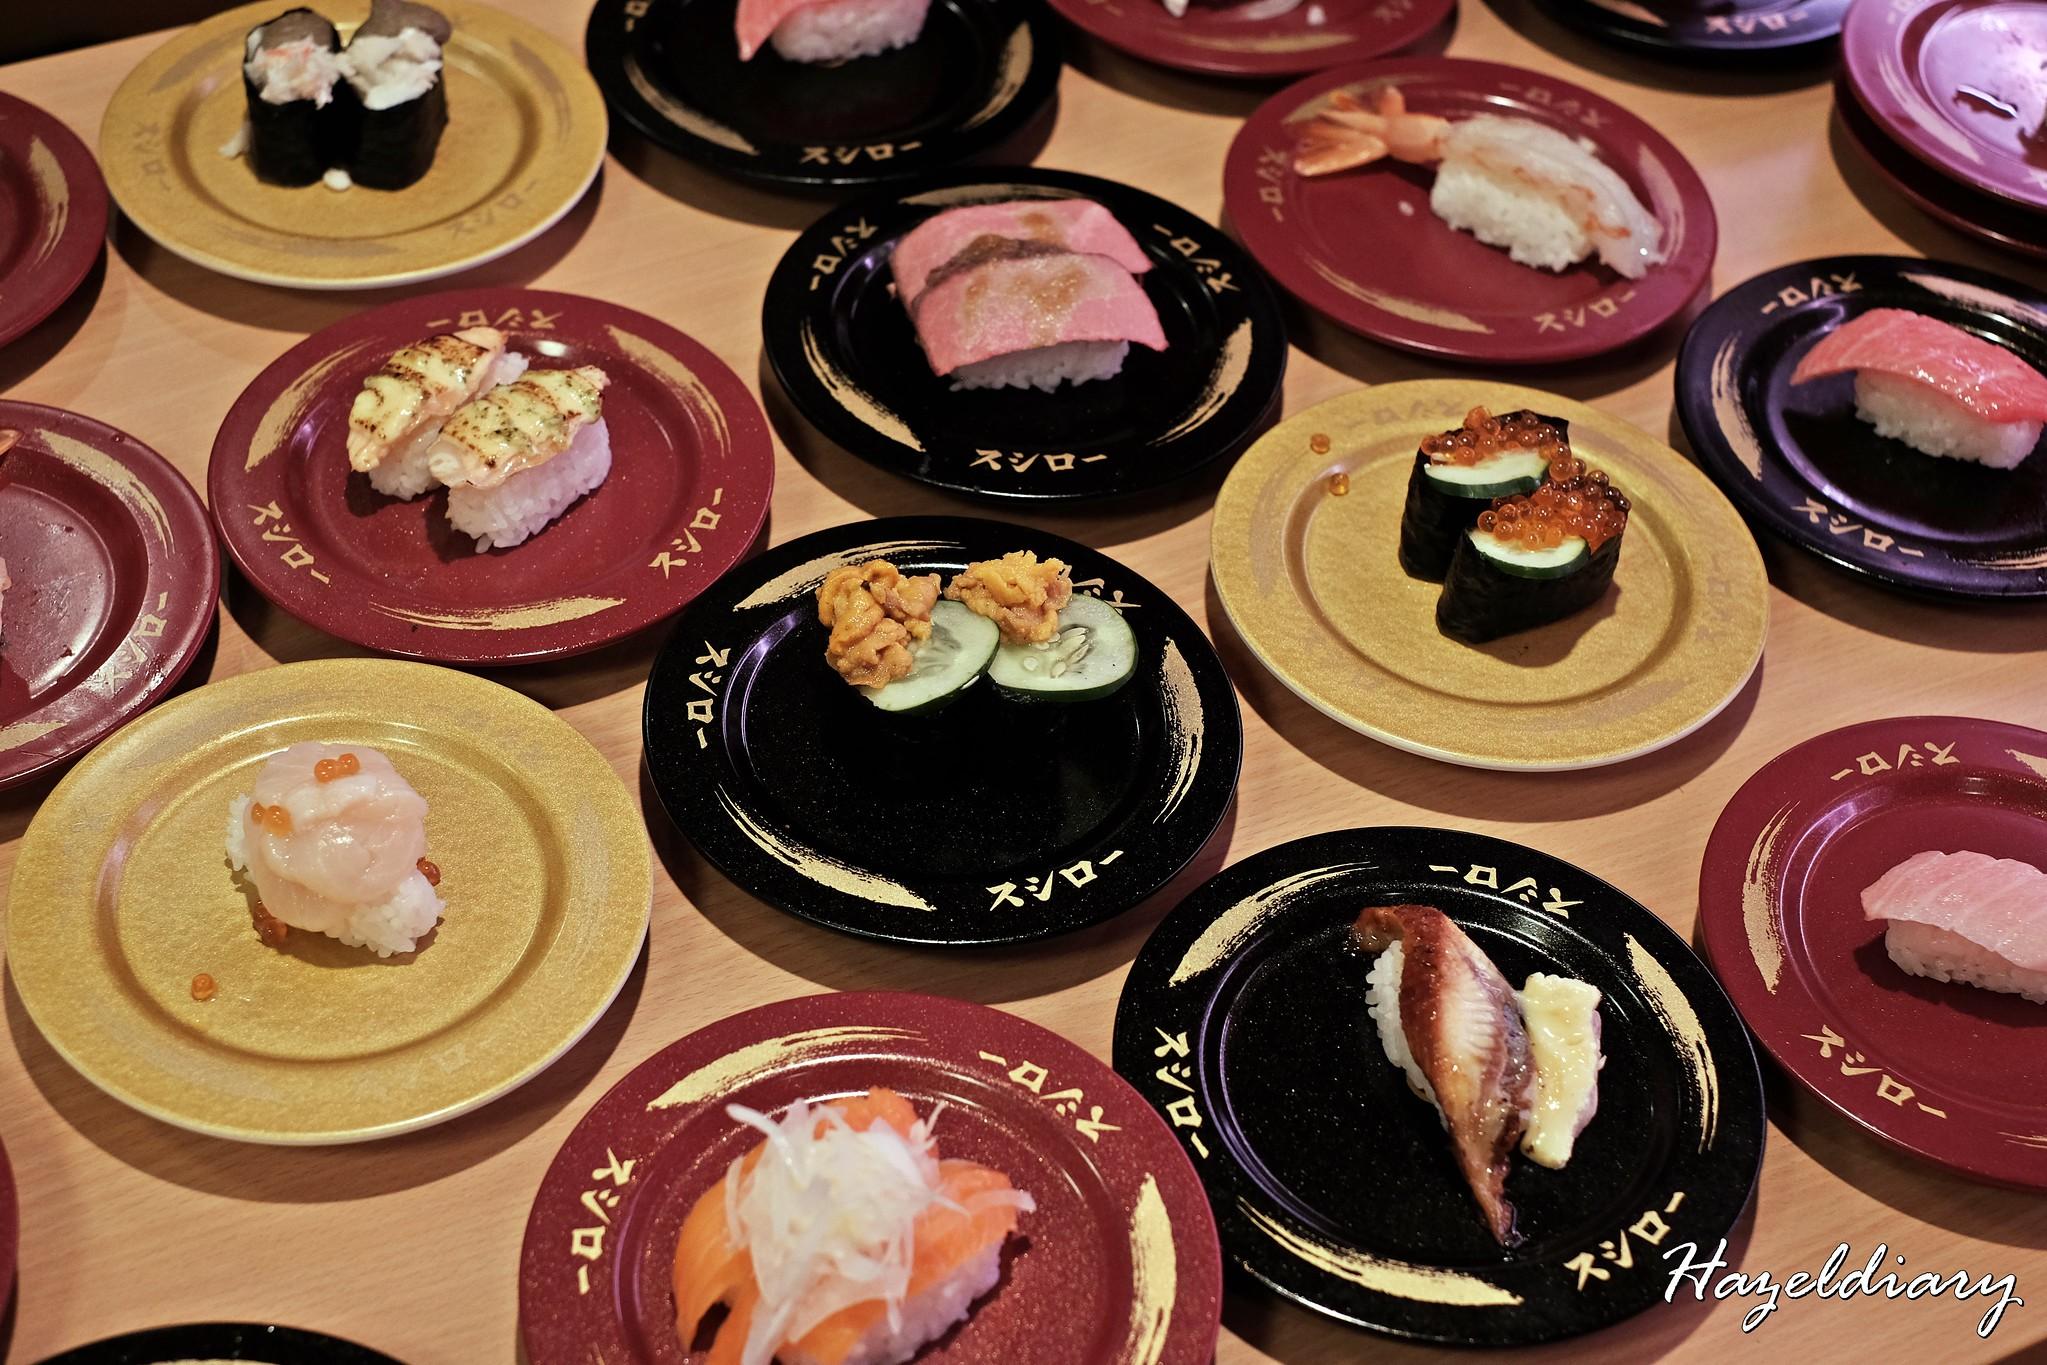 [SG EATS] Sushiro Singapore @Tiong Bahru Plaza- Japan's Largest Kaiten Sushi Chain